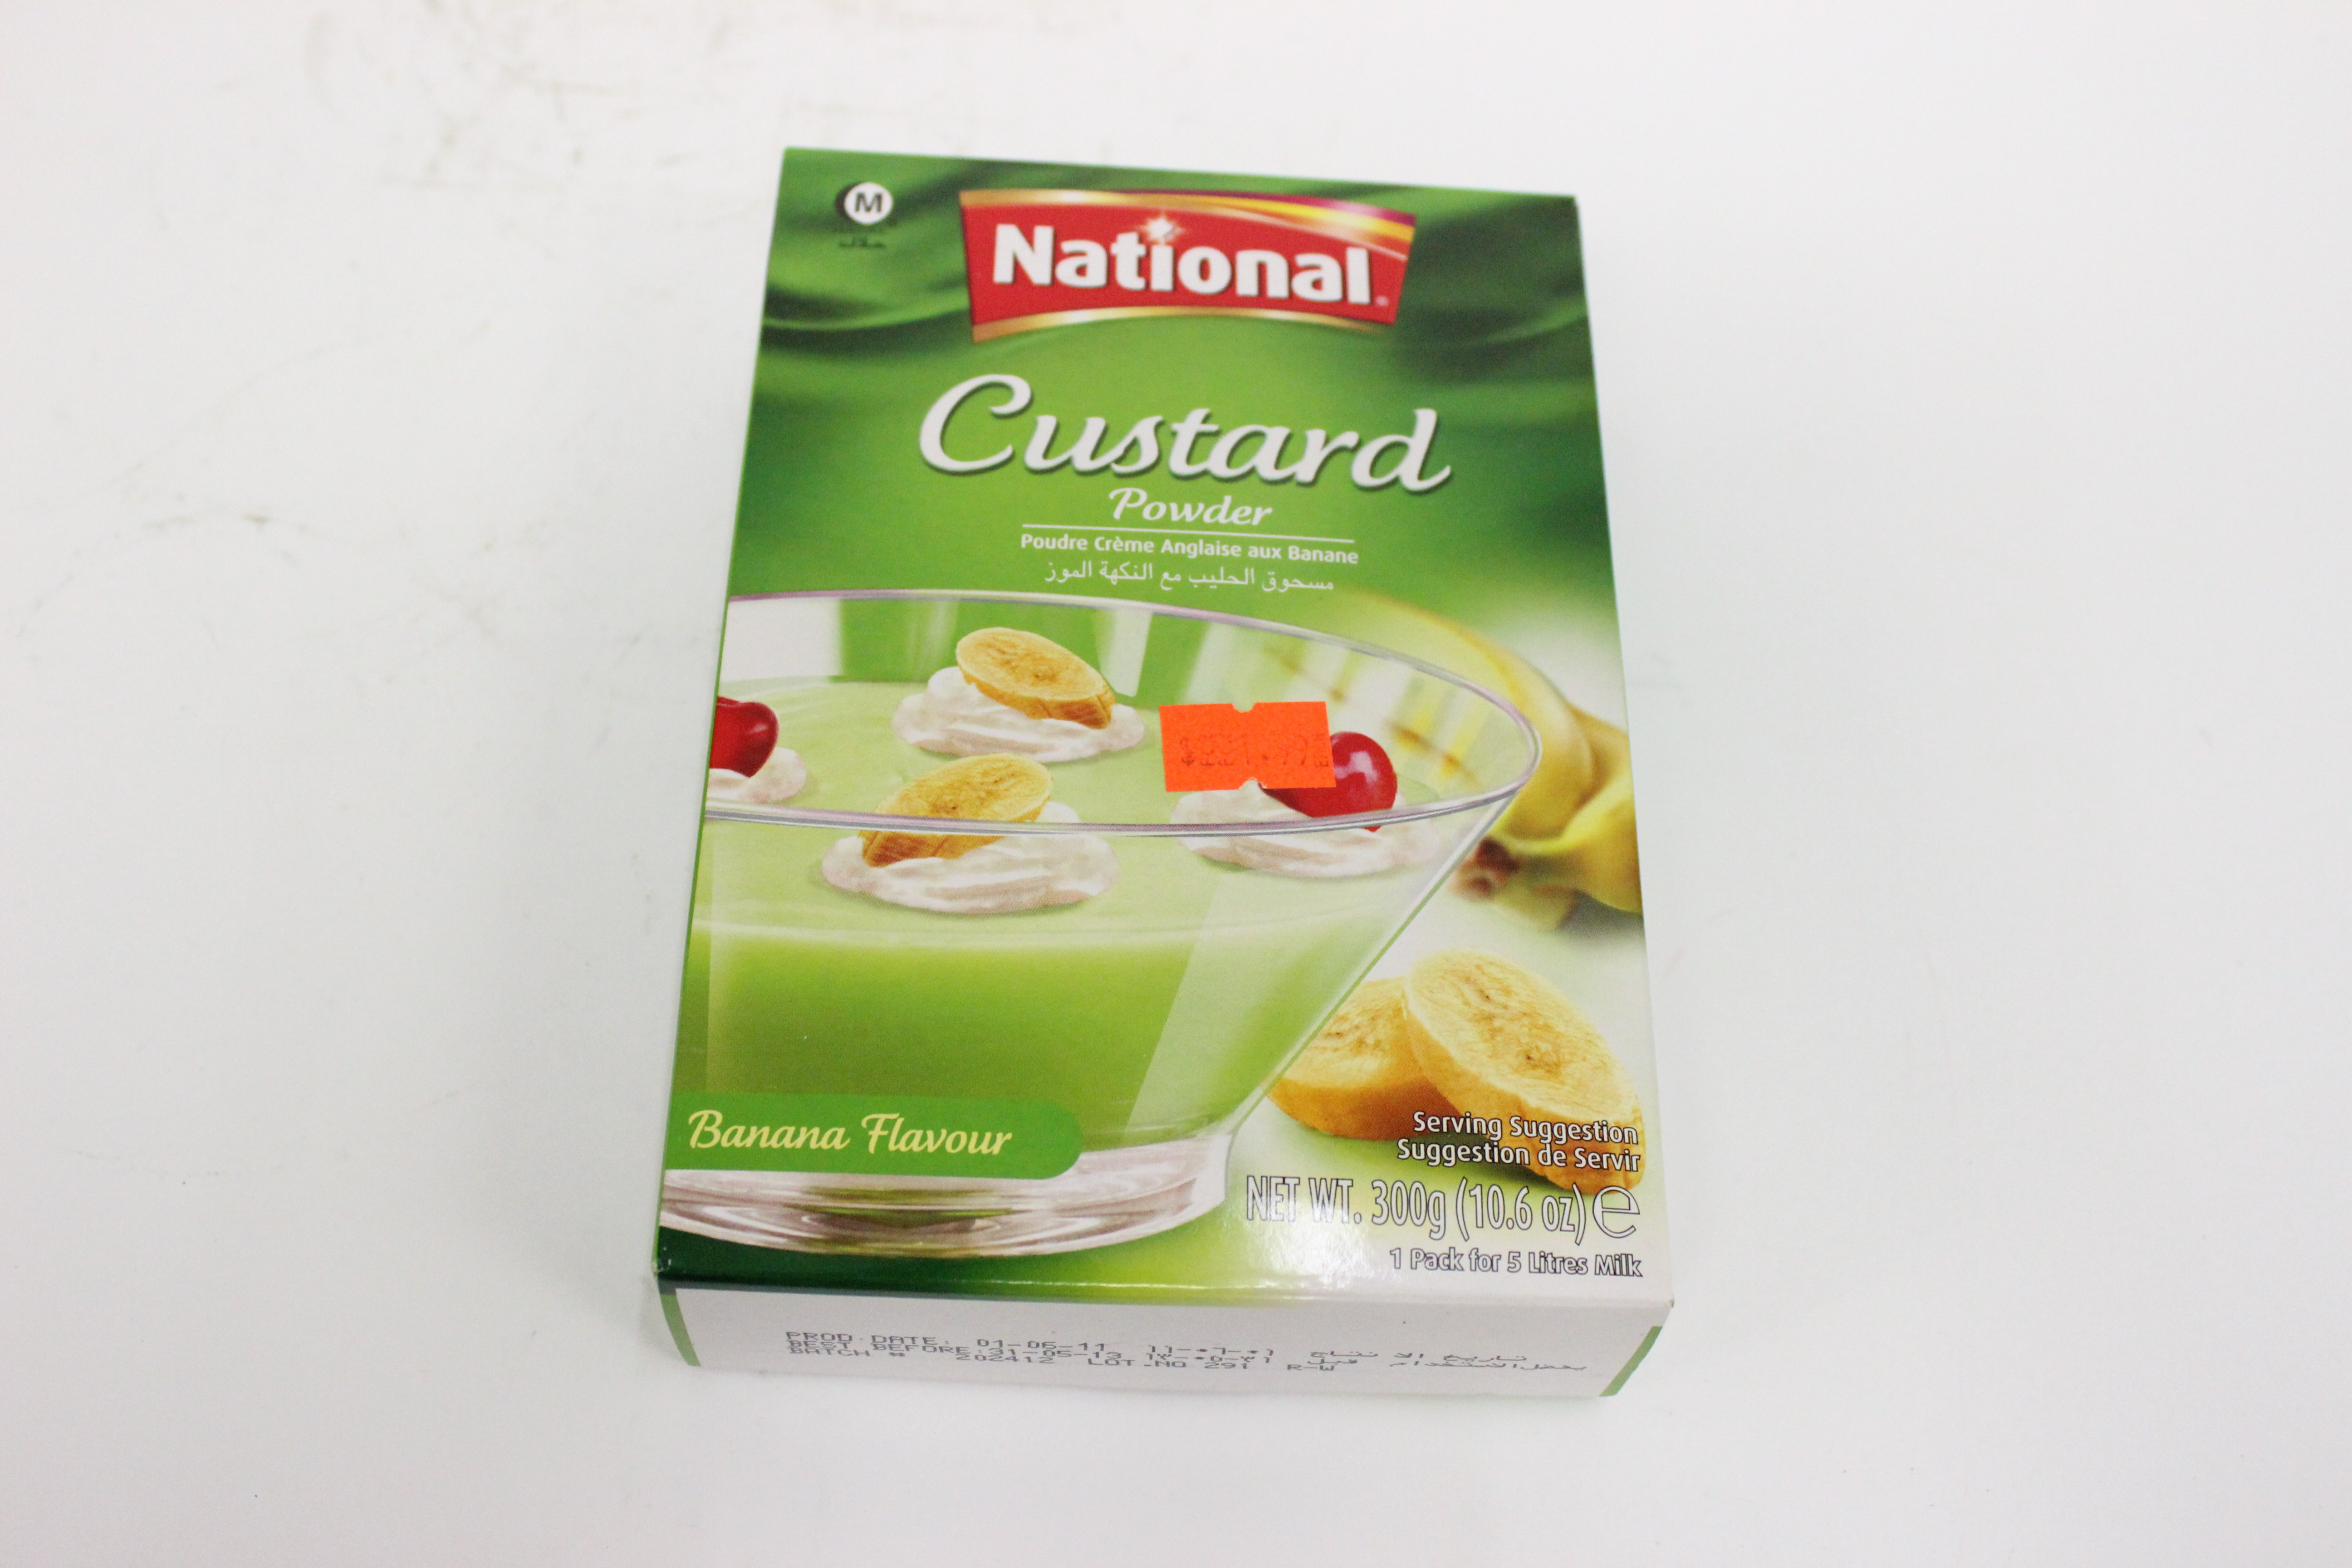 National Custard Powder Banana Flavour 300 grm